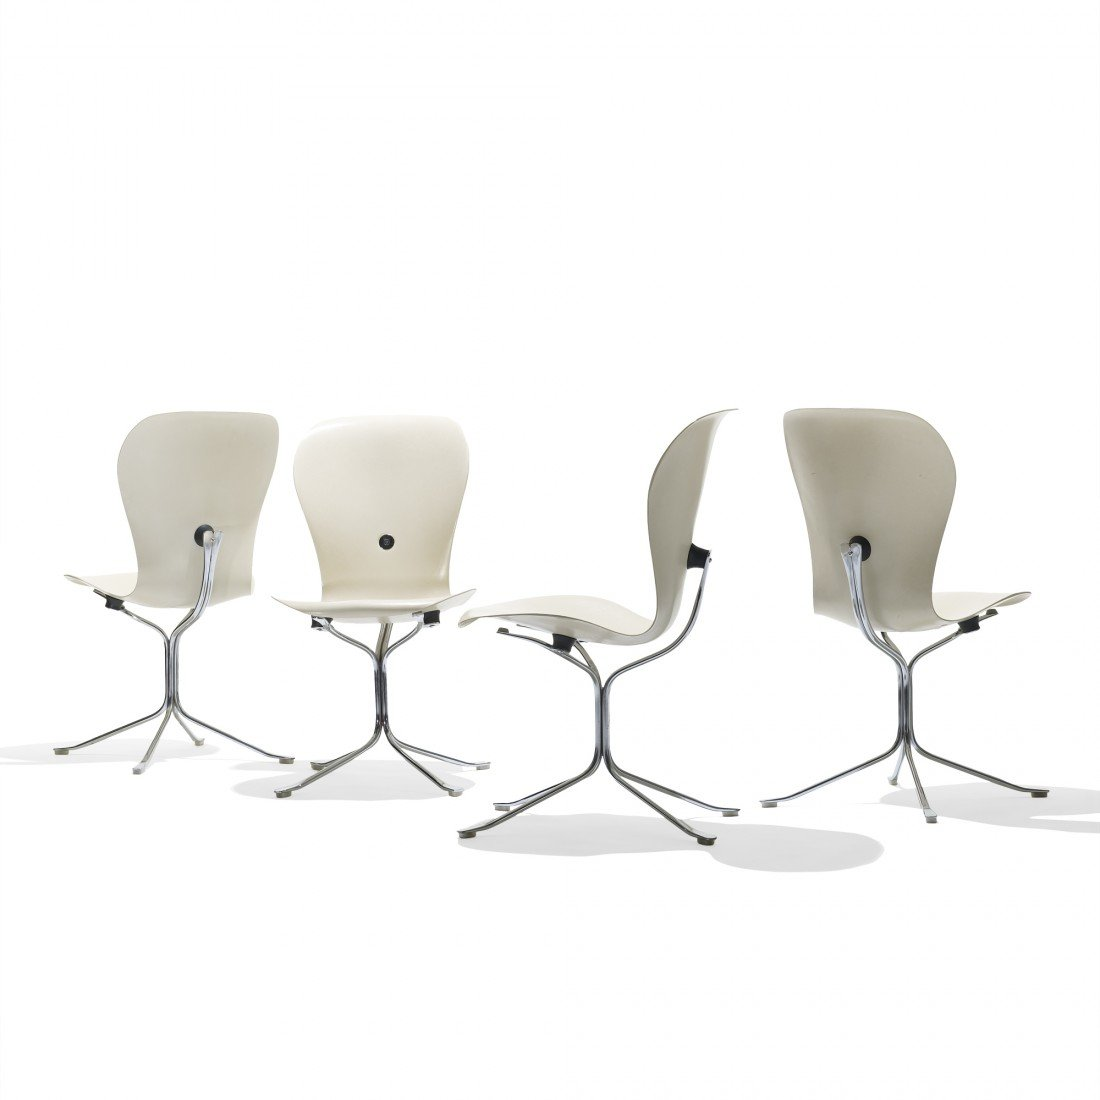 139: Gideon Kramer Ion chairs, set of six